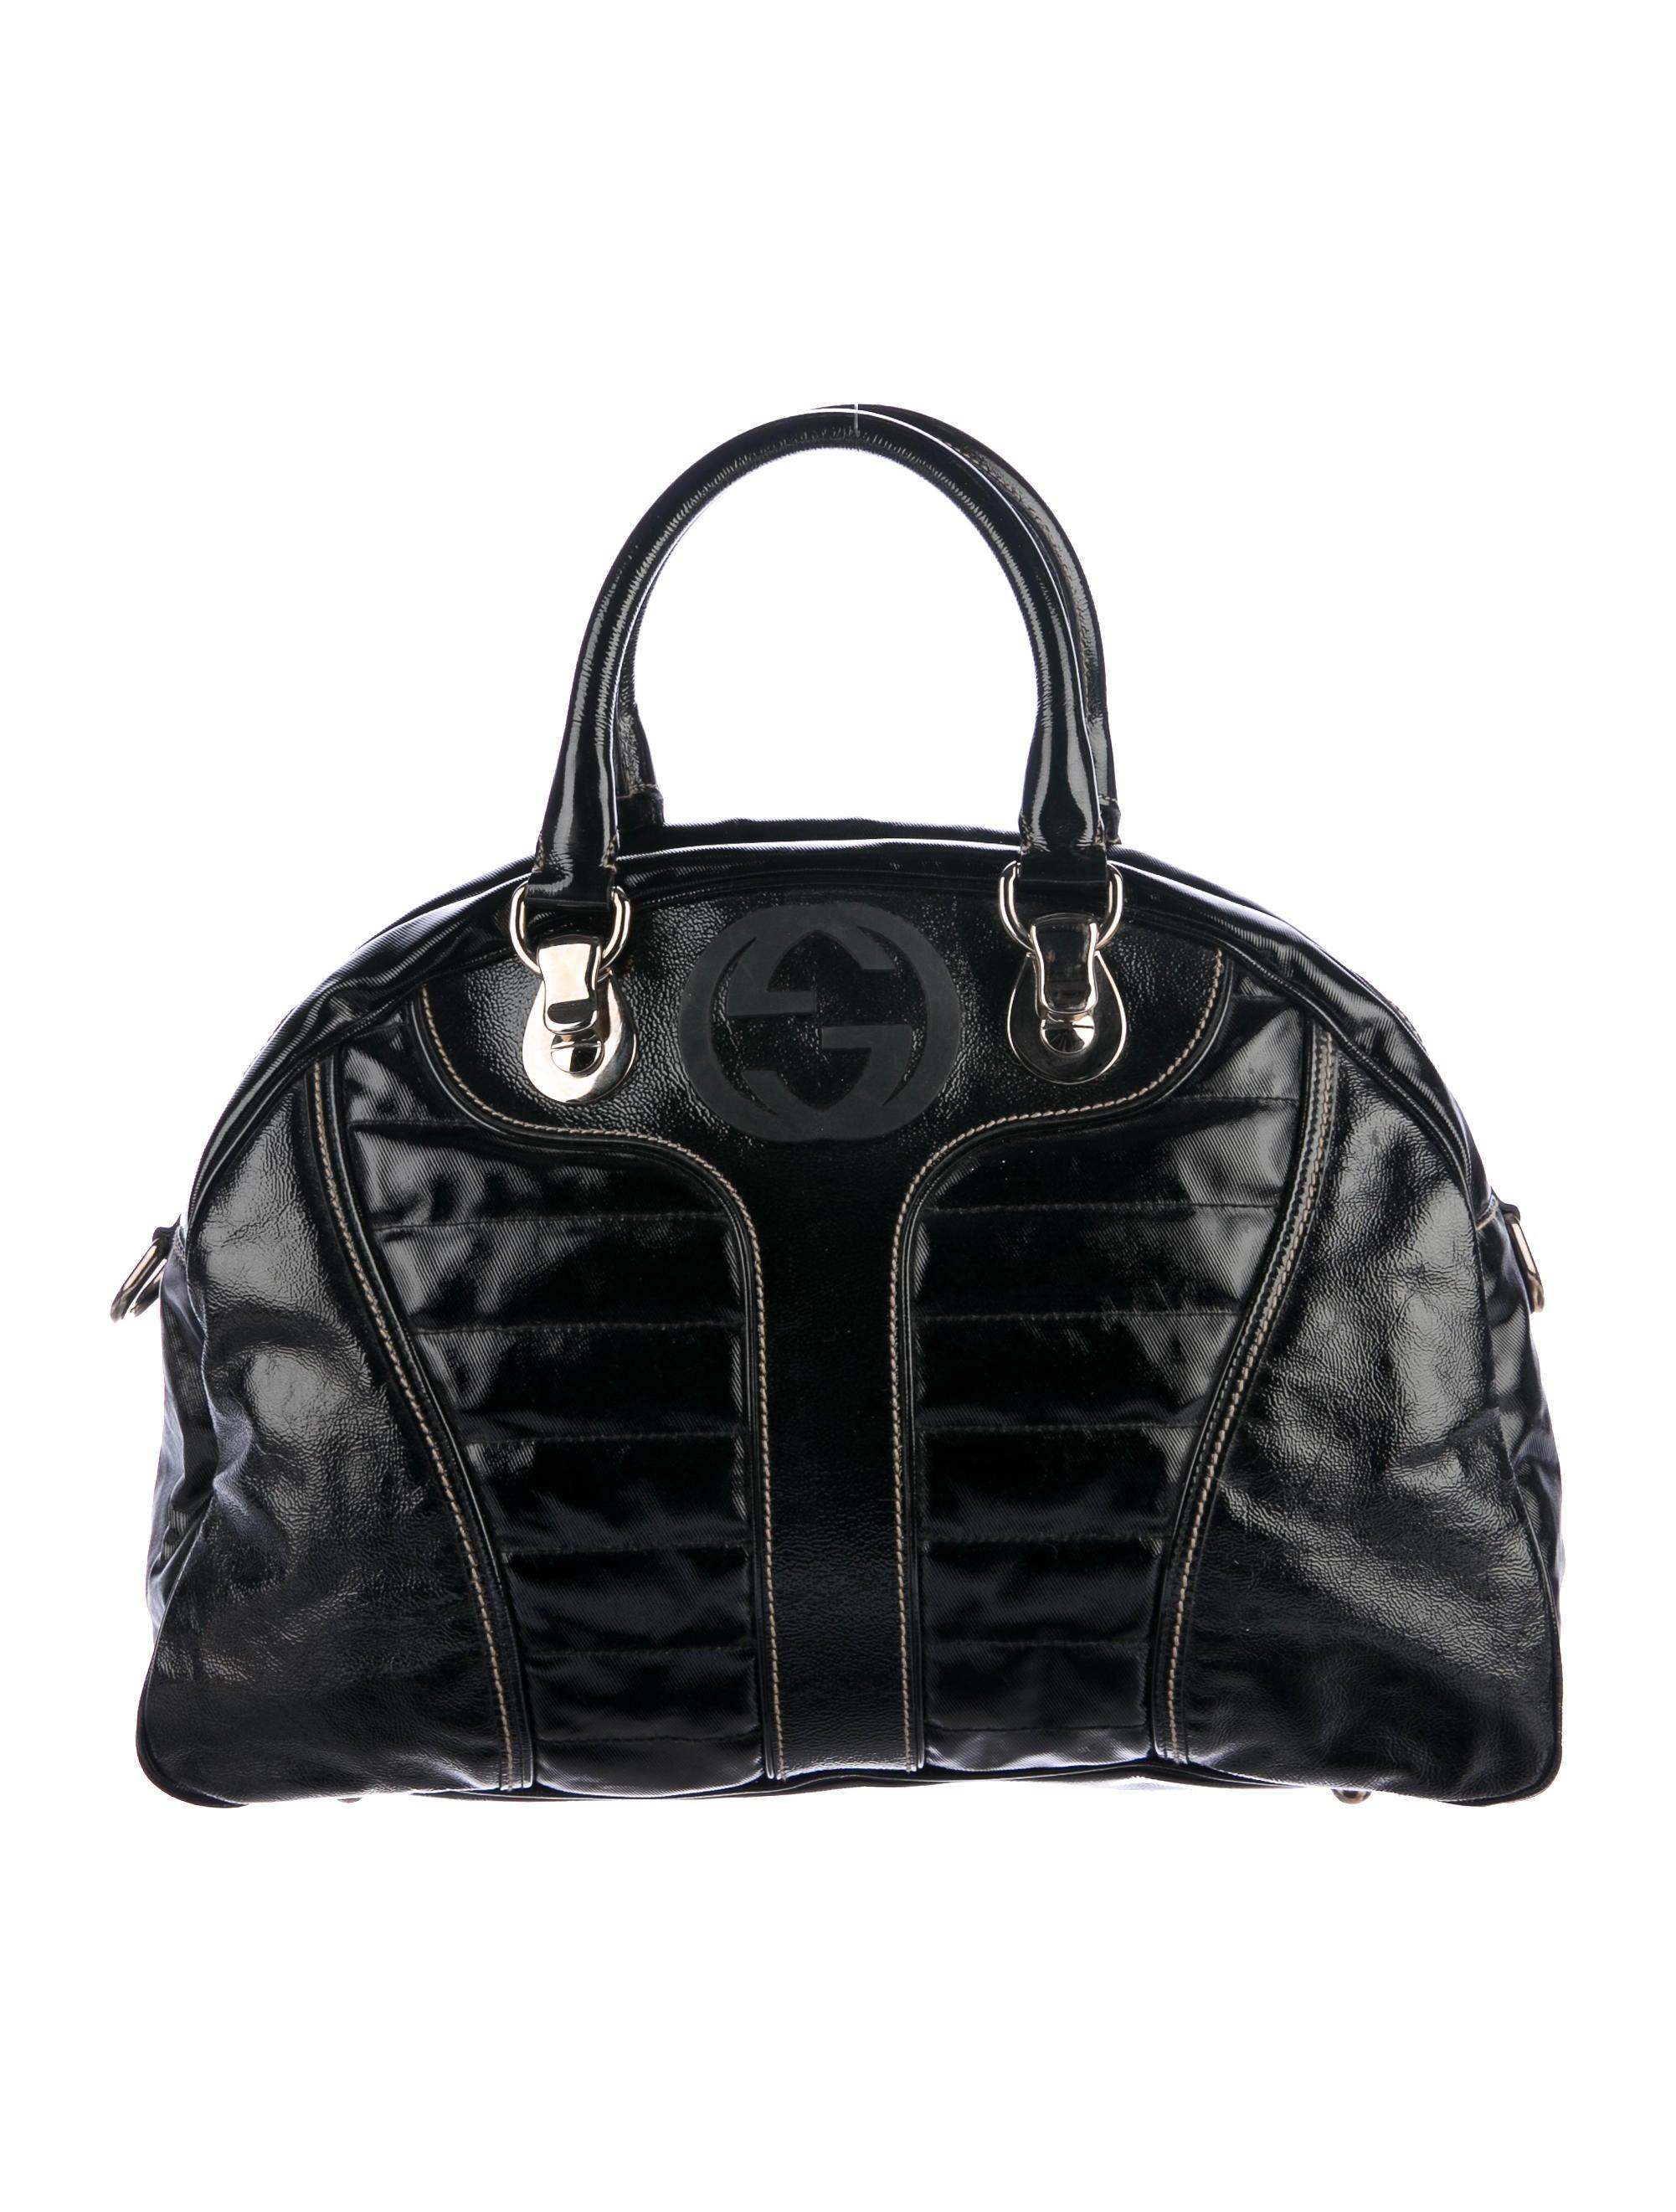 Boston Bag Patchwork Tutorial: Gucci Snow Glam Boston Bag - Handbags - GUC159154